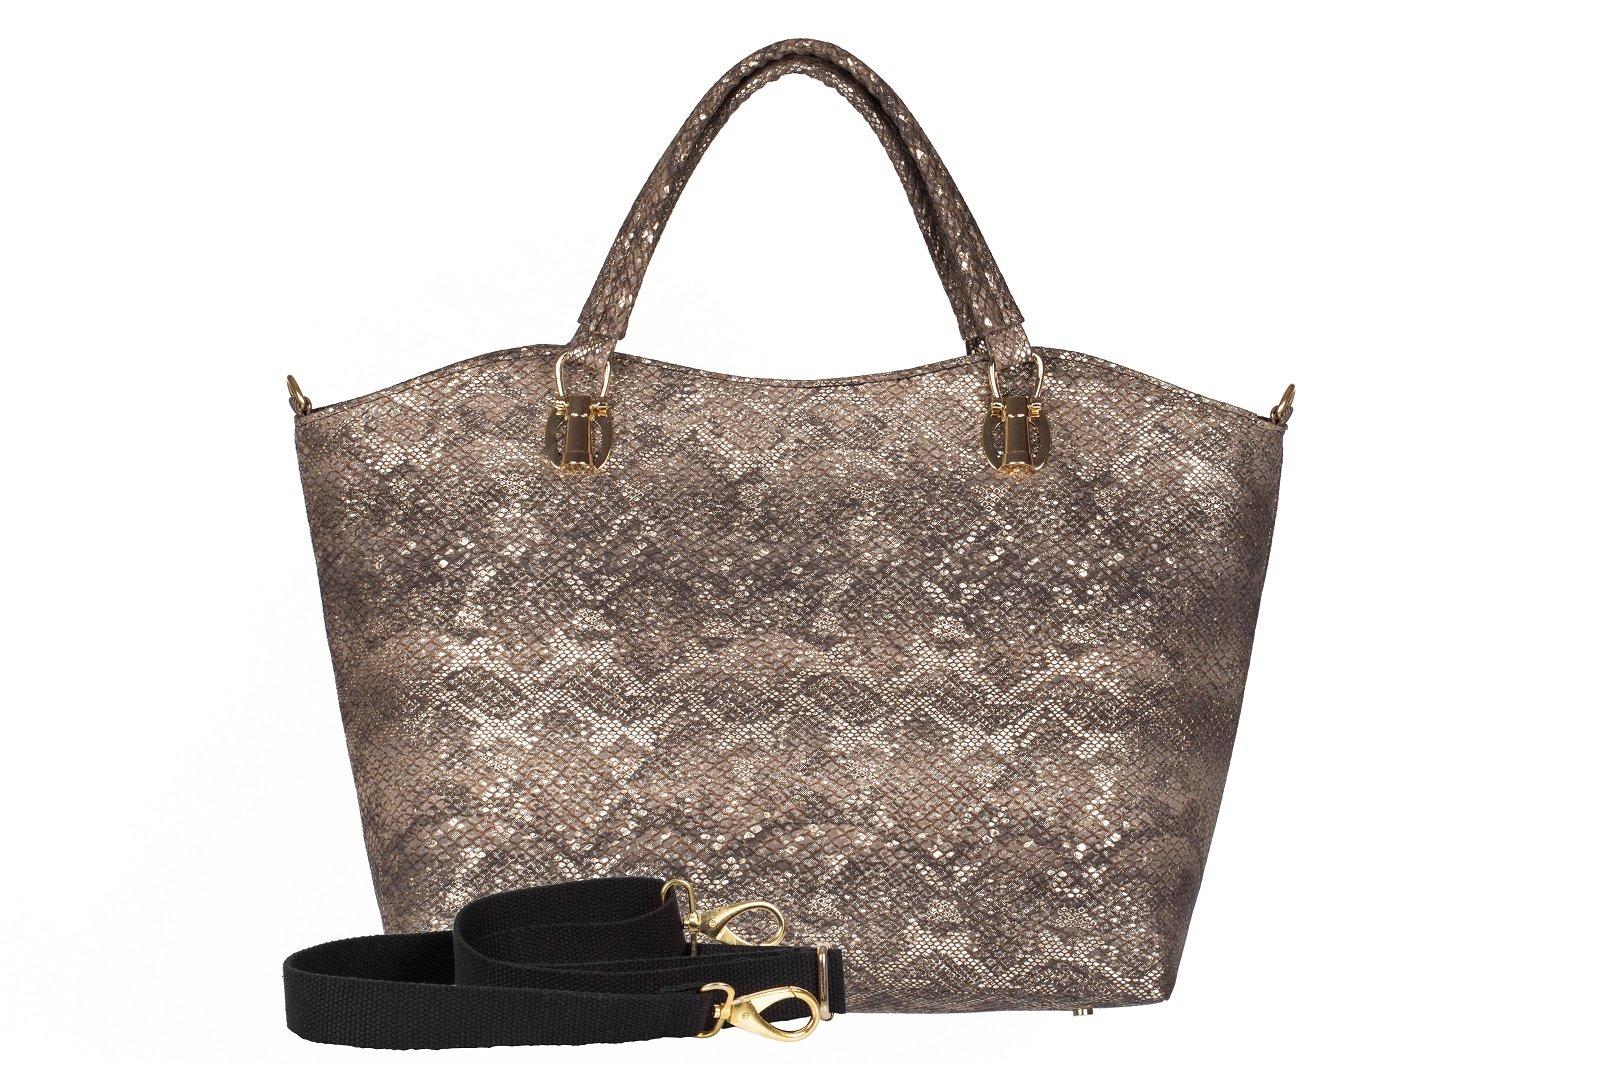 f1740c105ca47 Torebka shopper bag A4 skóra wąż - MB CLASSIC BAG